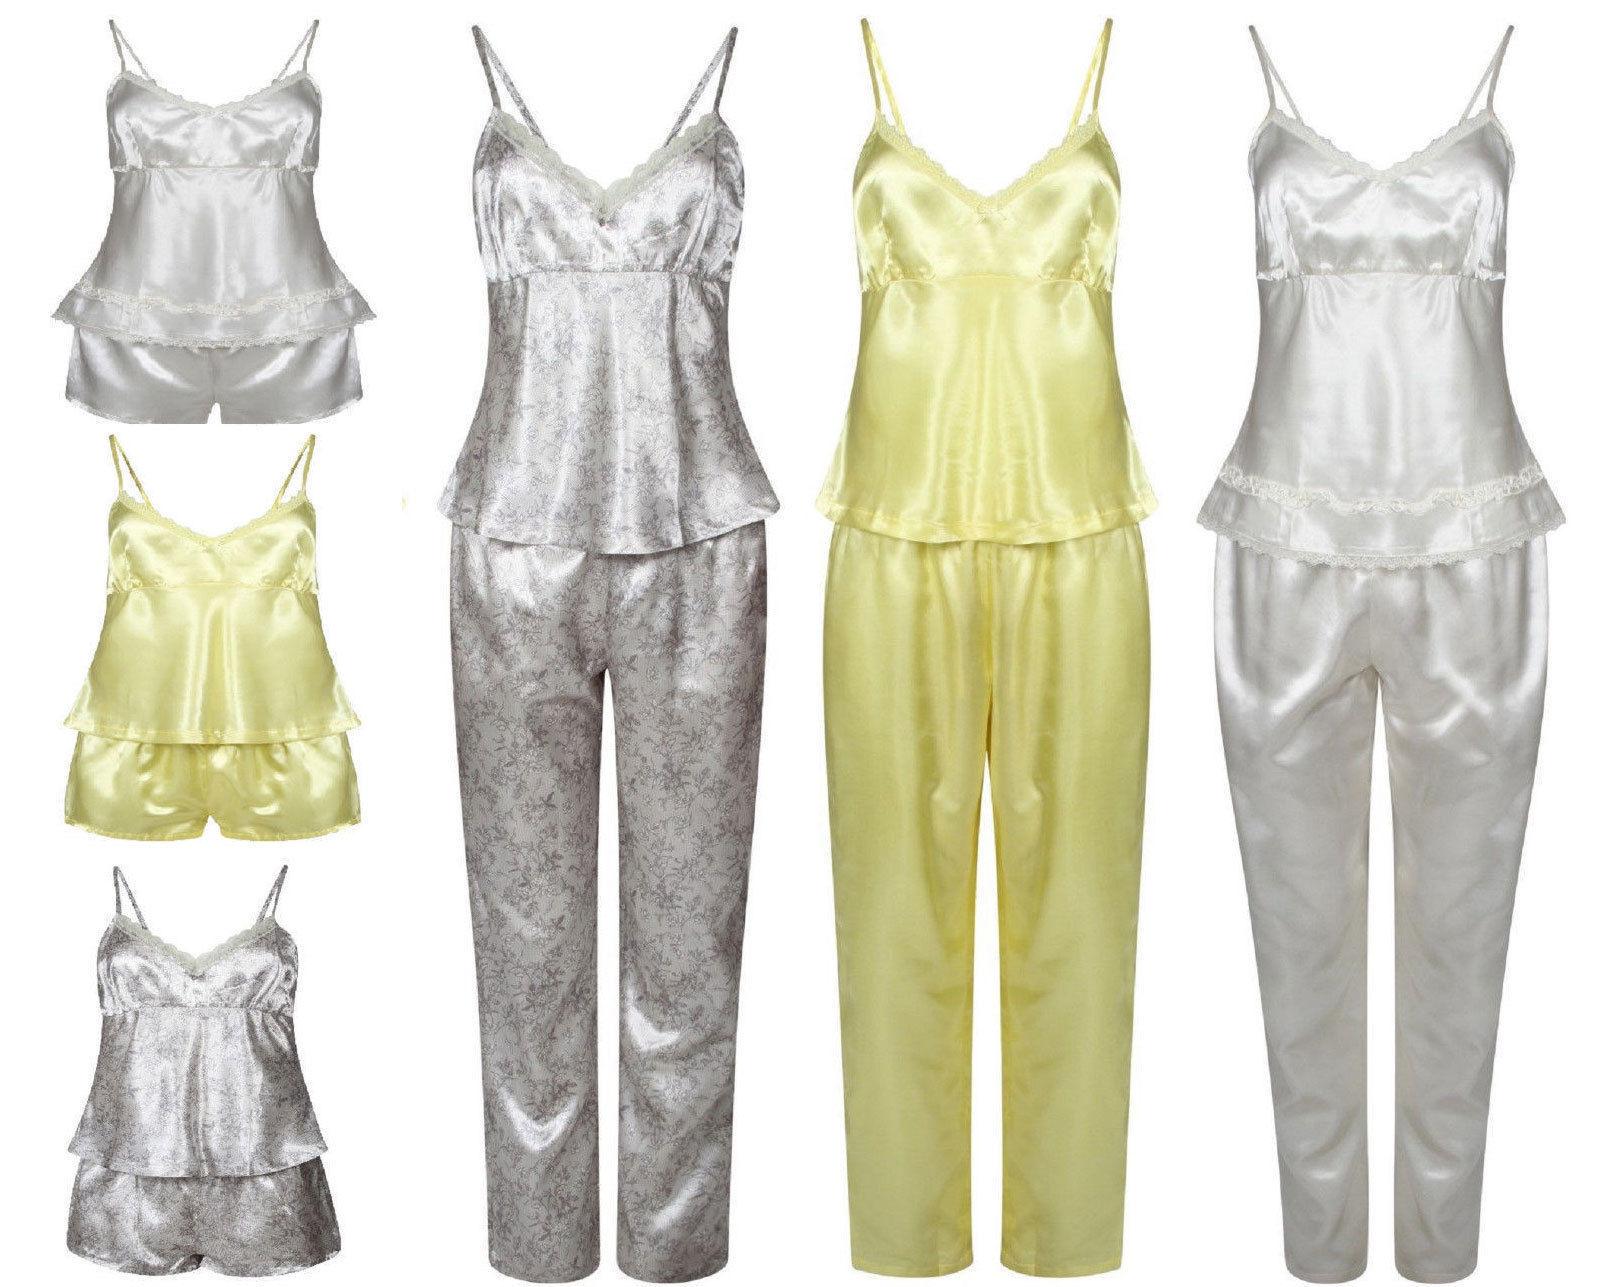 3336ca8bf0 Product Details. Ladies 3 Piece Satin Pyjama Set Womens Vest Lace Shorts  PJ S Nightwear